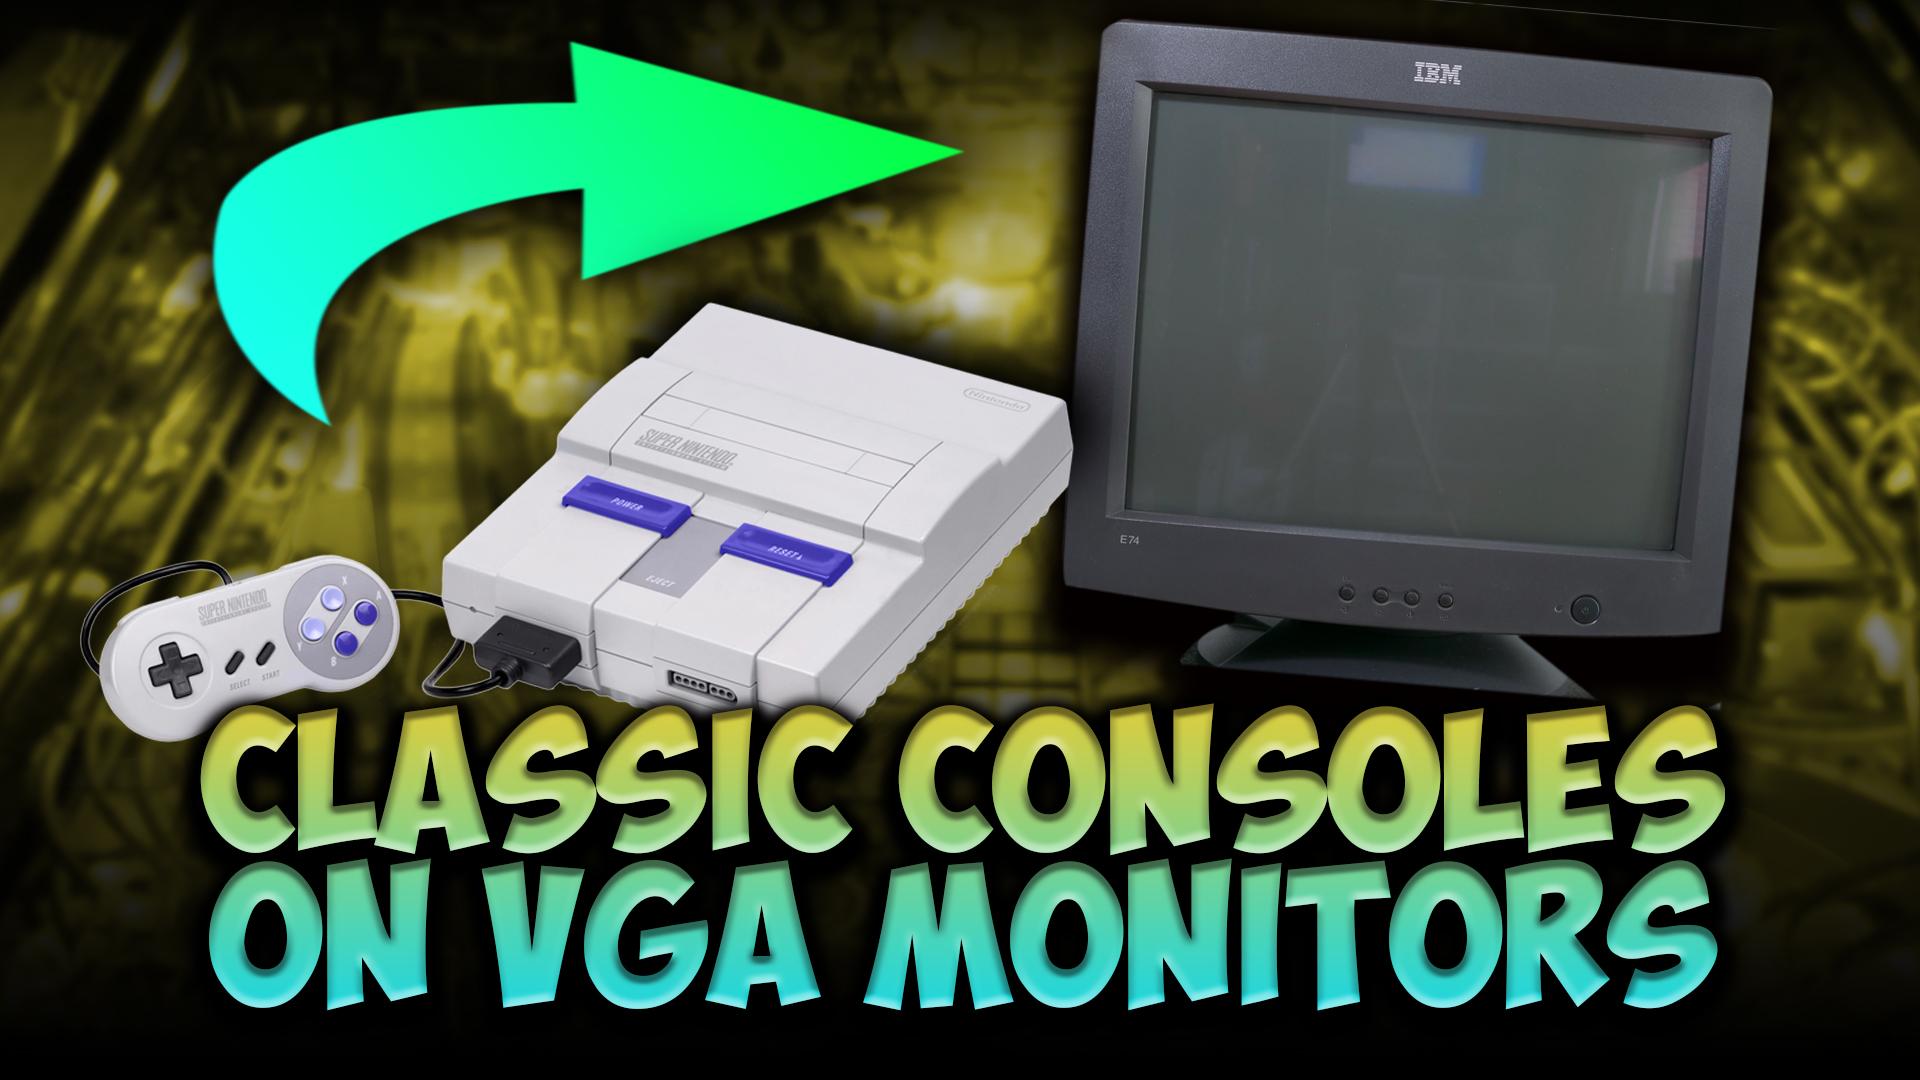 Classic Consoles on VGA Monitors